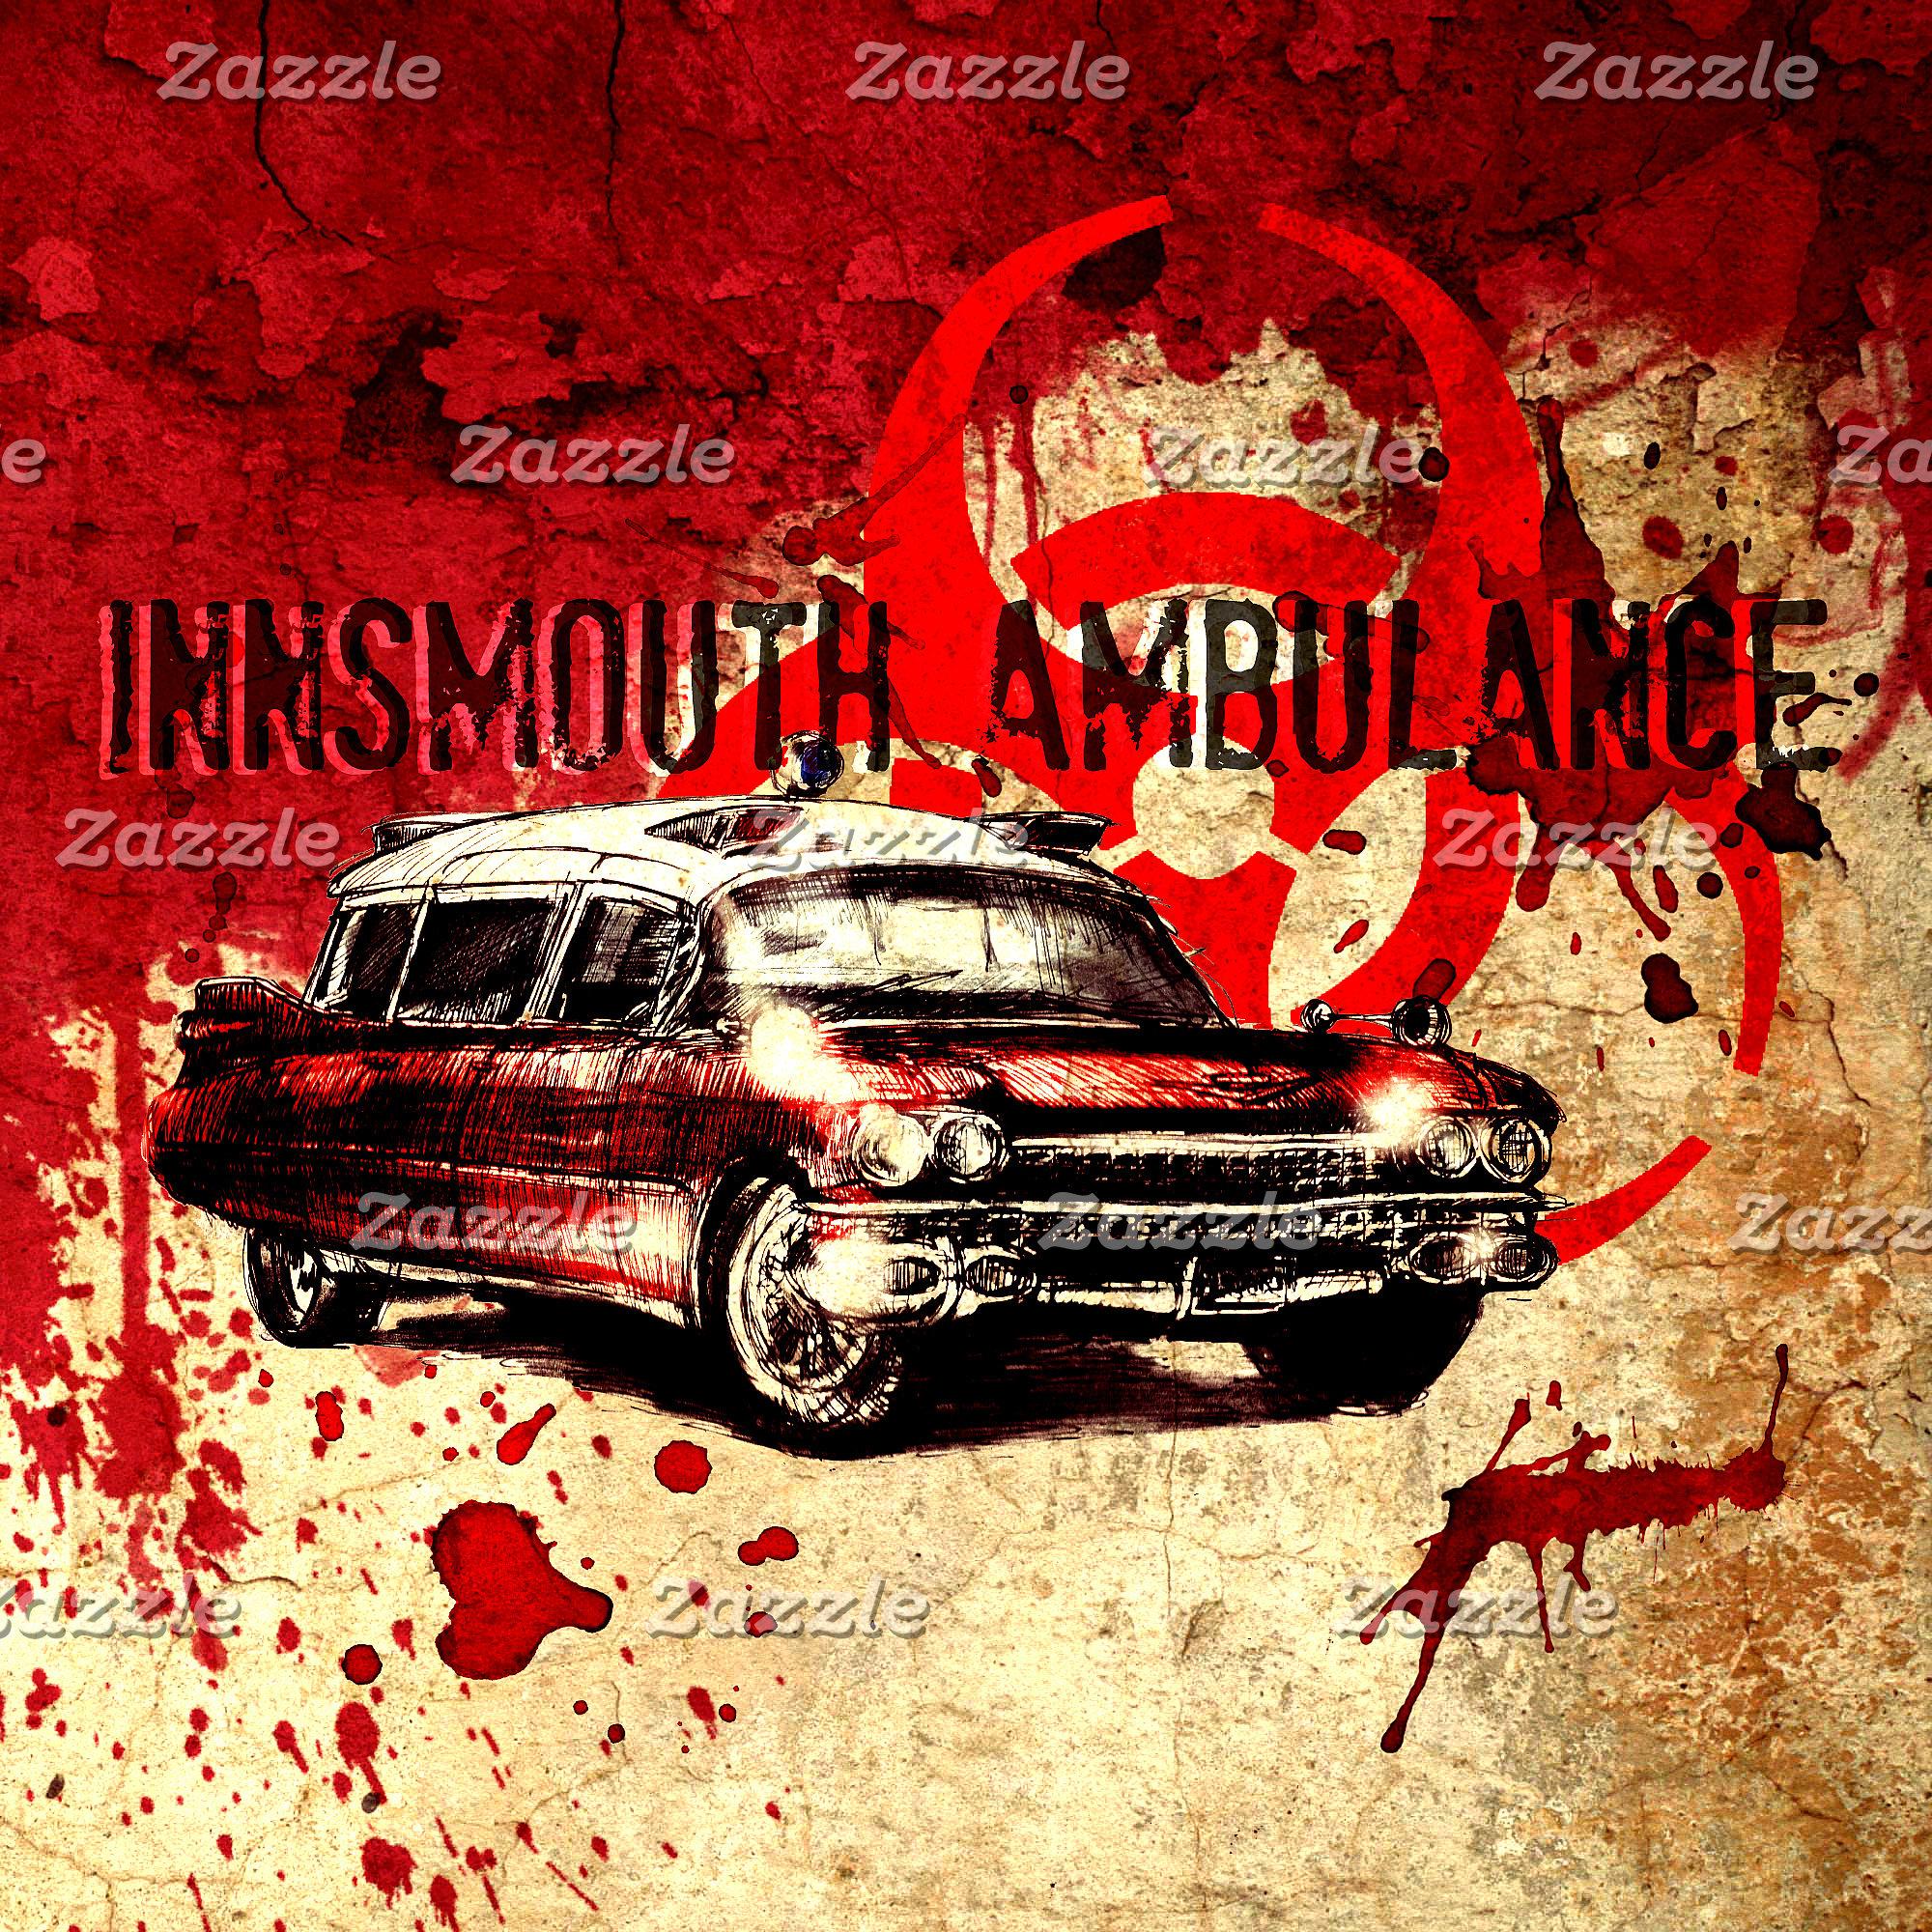 Lovecraft Style Horror Ambulance